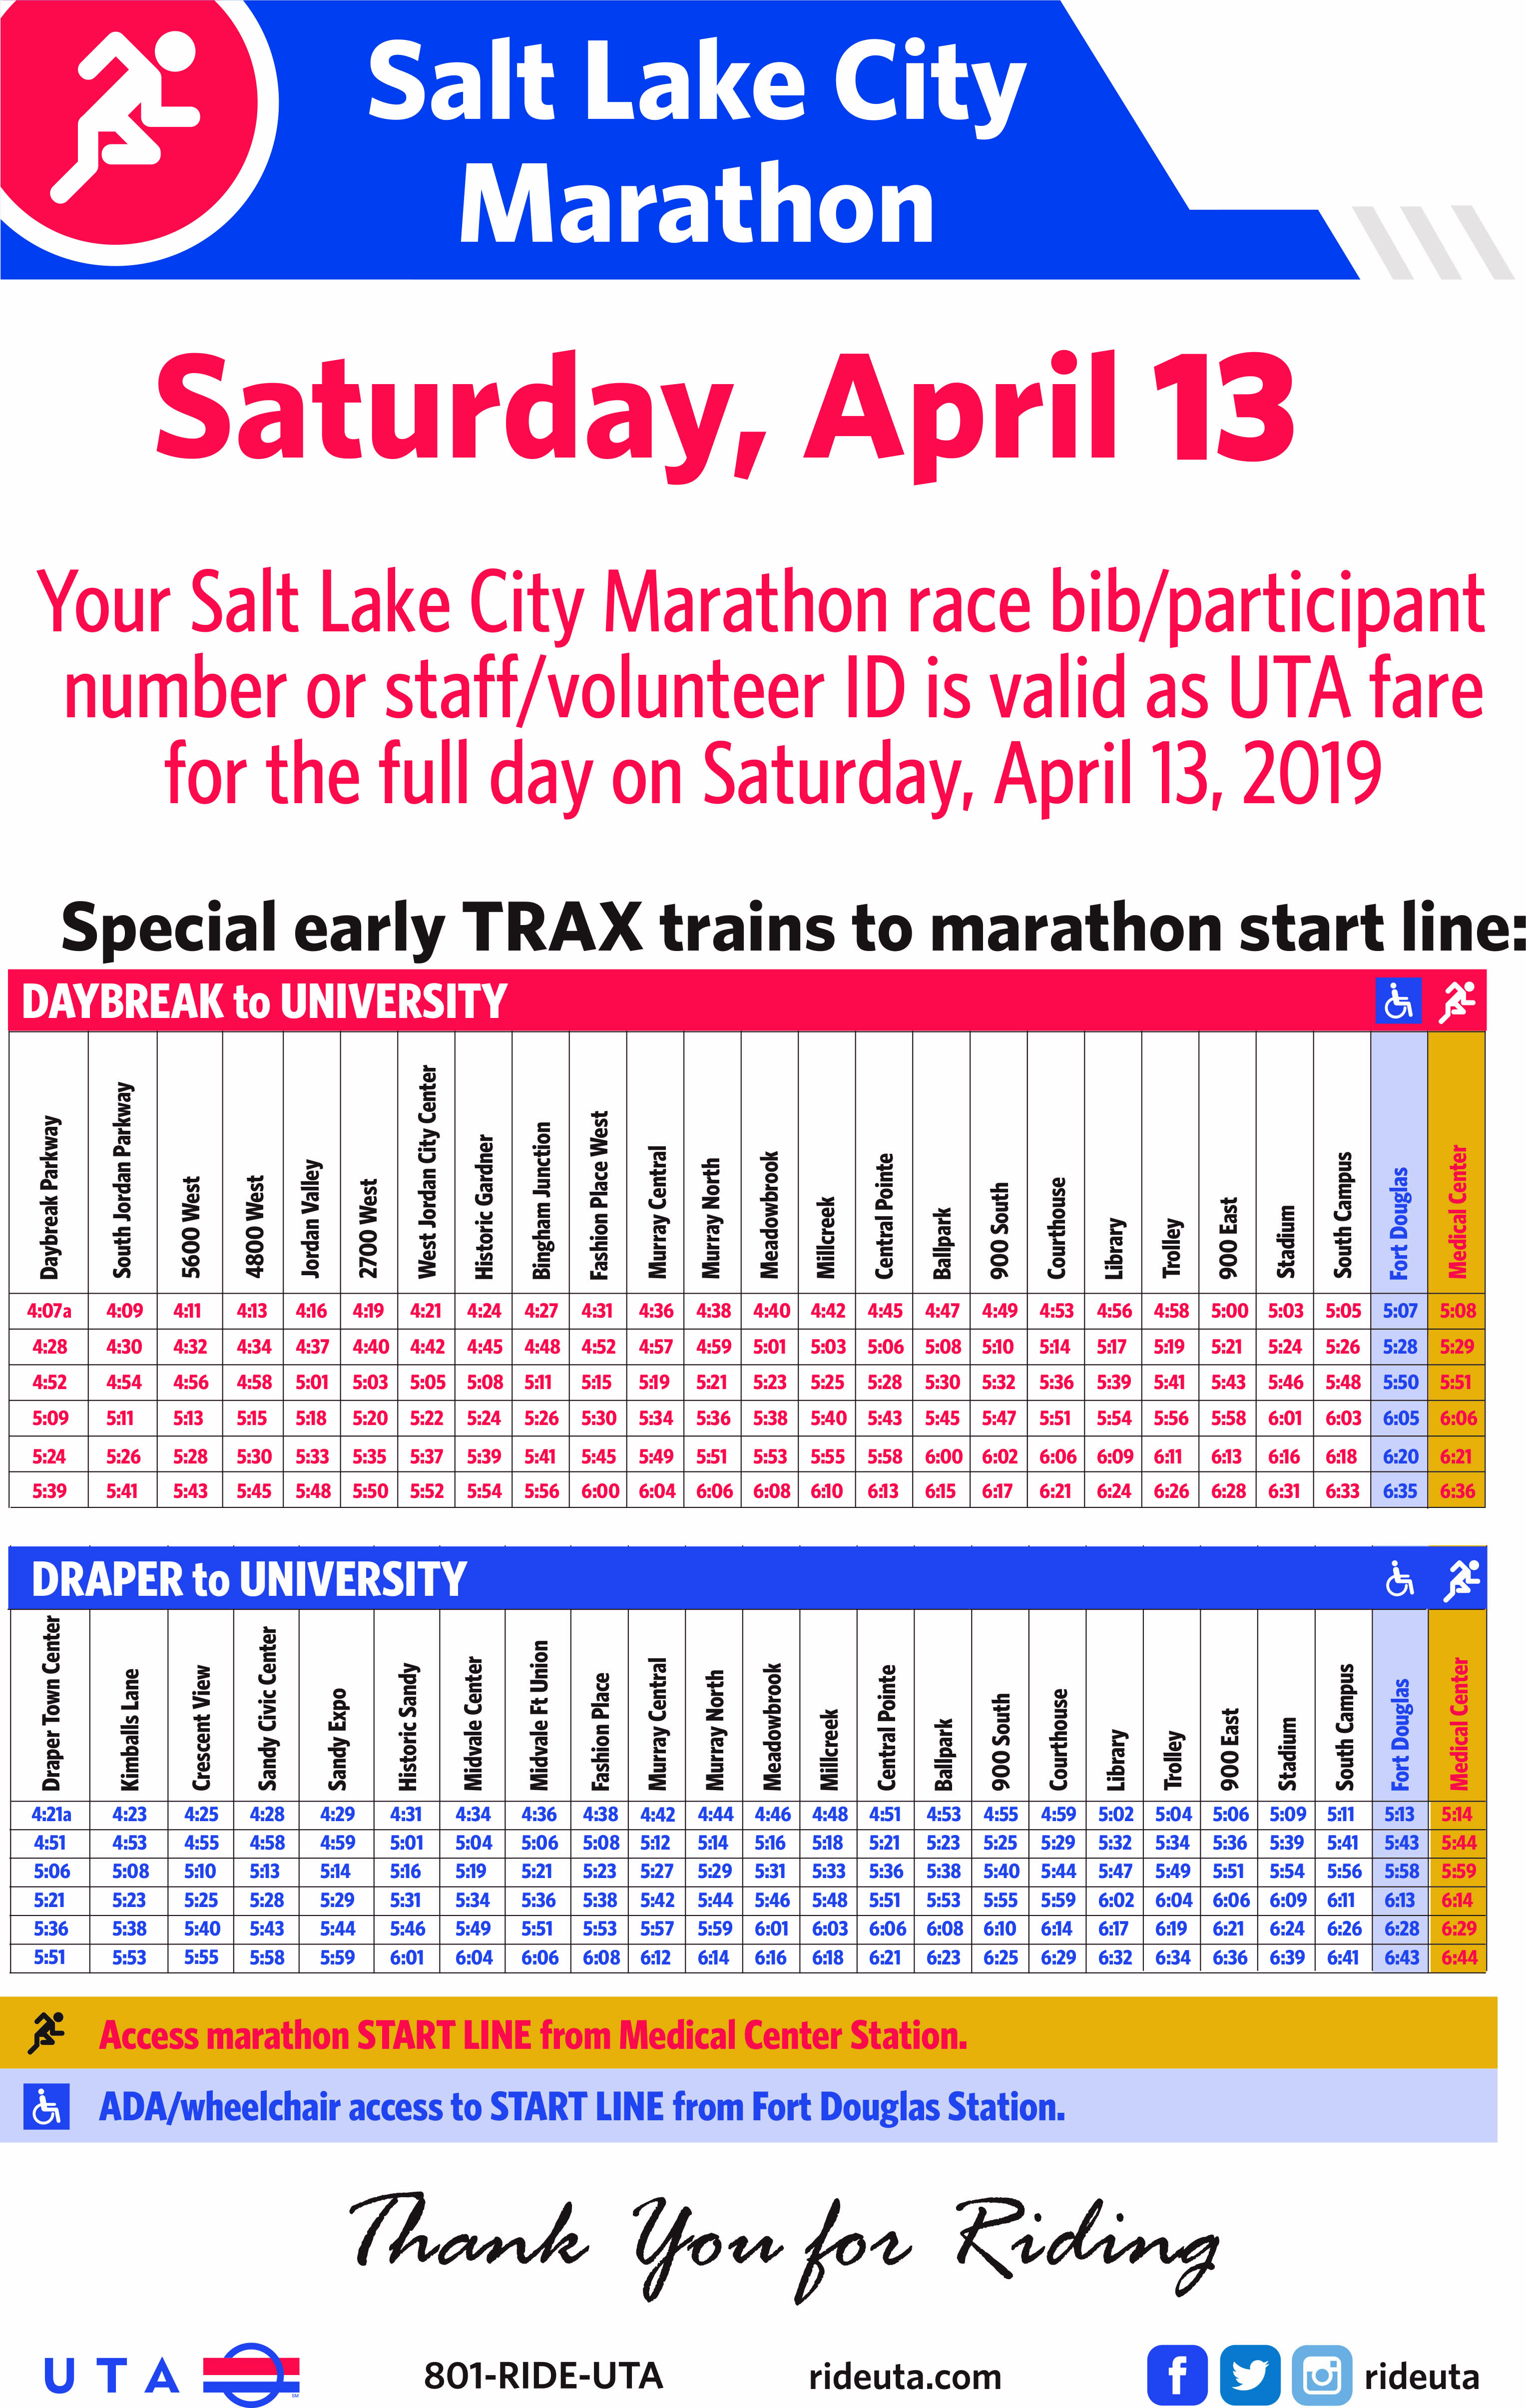 UTA Offers Early Service to SLC Marathon